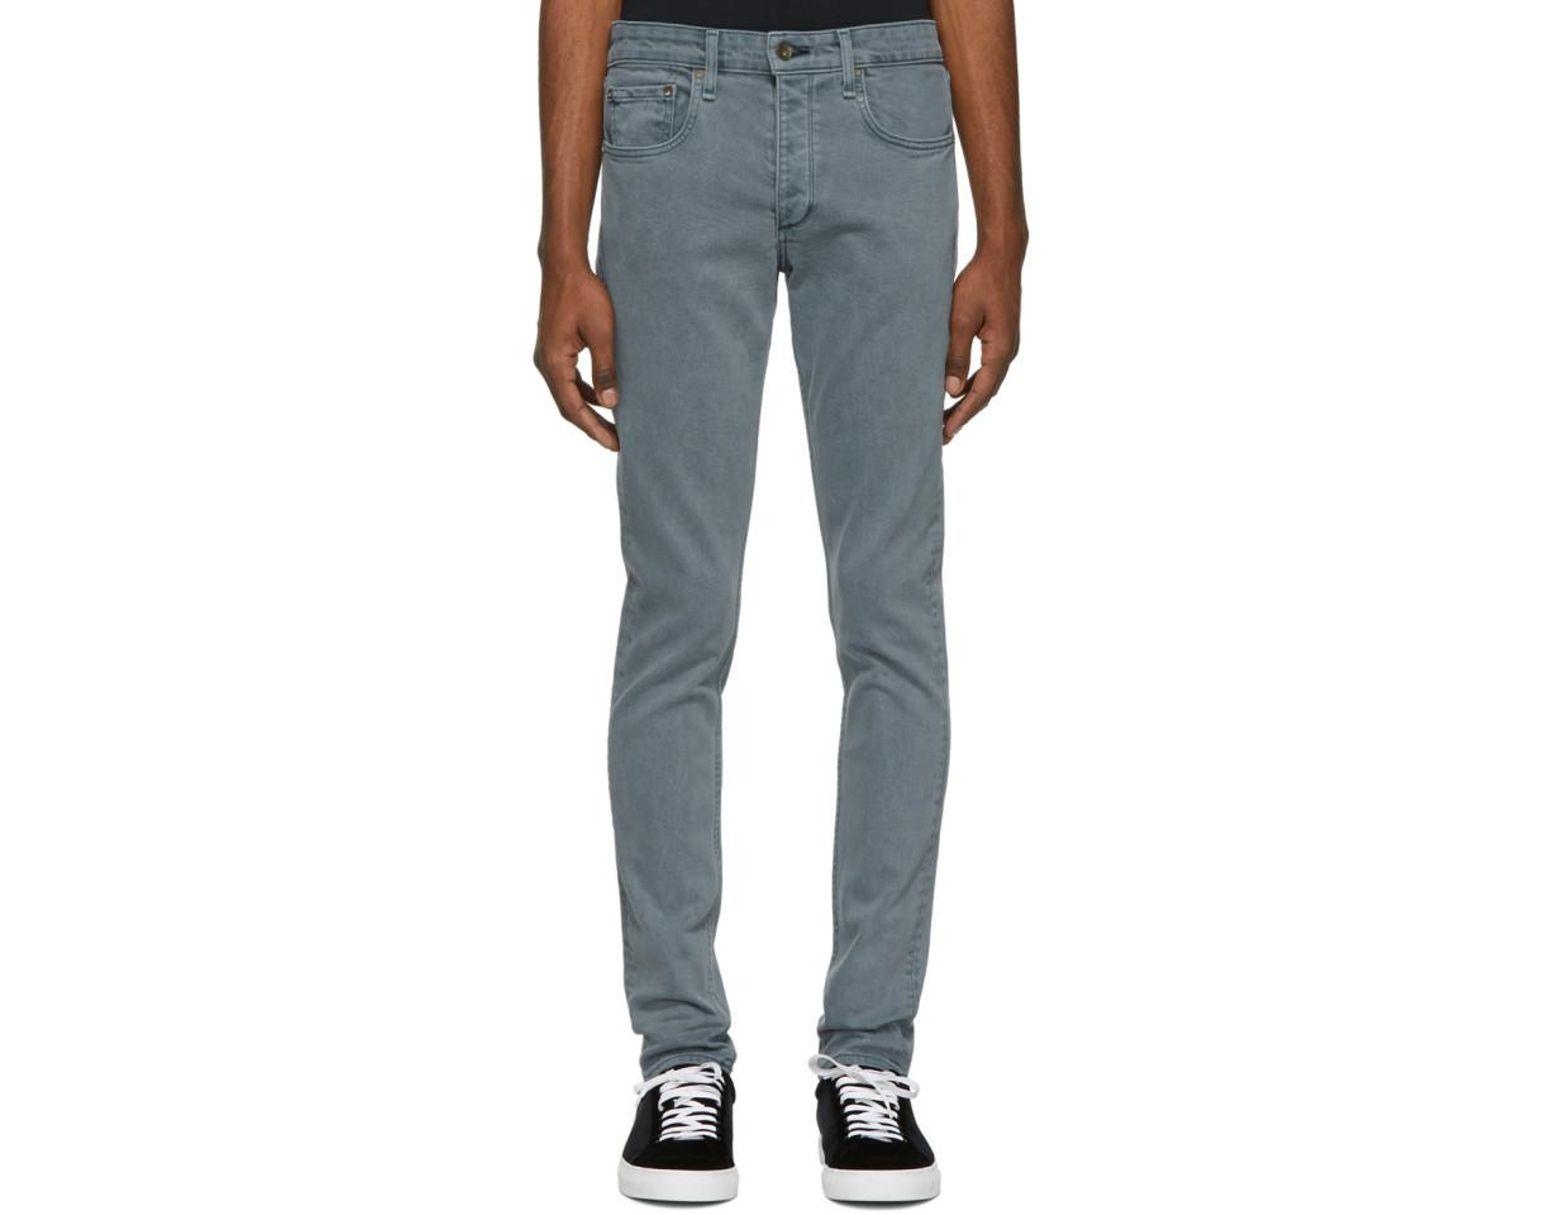 6cf0195365ffe2 Rag & Bone Blue Sausalito Fit 1 Jeans in Blue for Men - Lyst